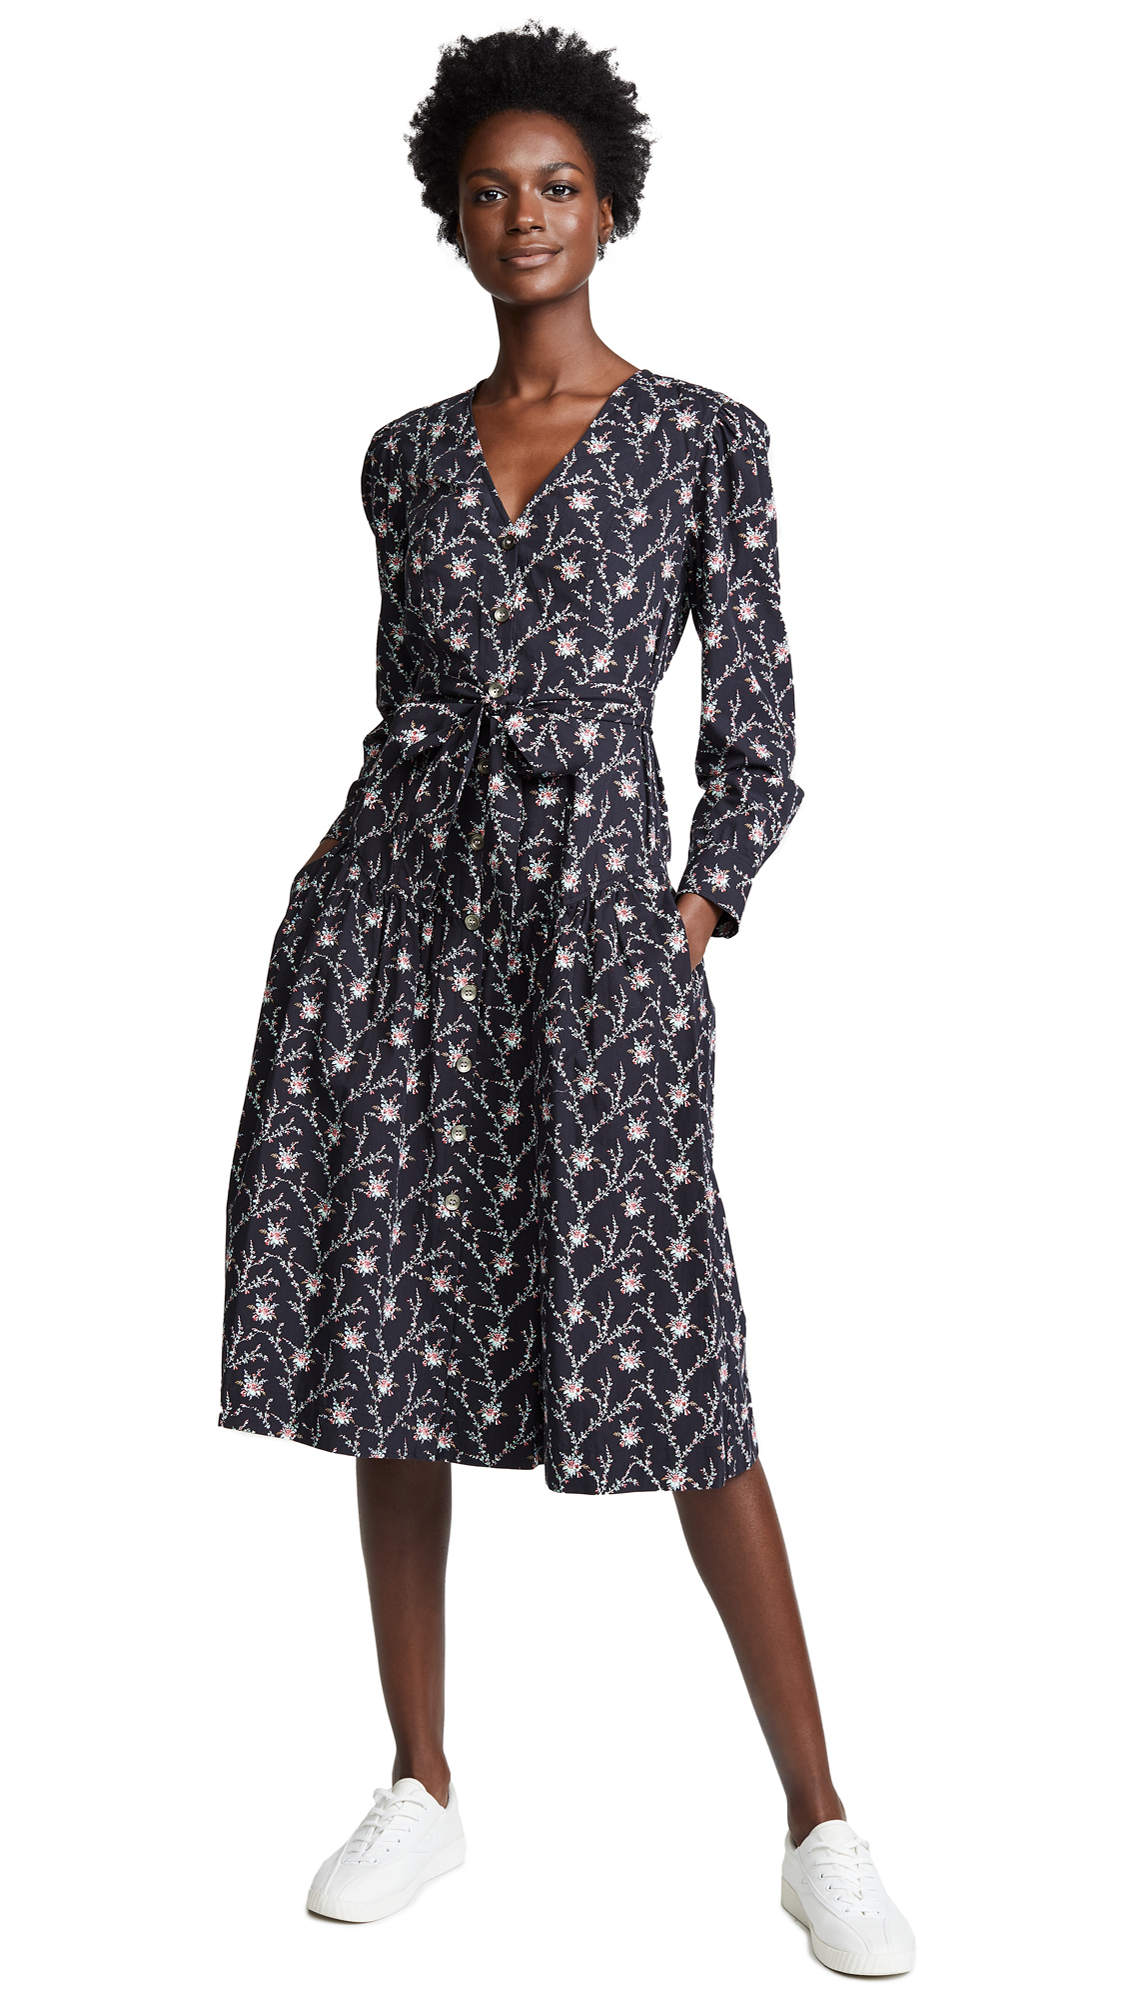 La Vie Rebecca Taylor Aubrie Dress